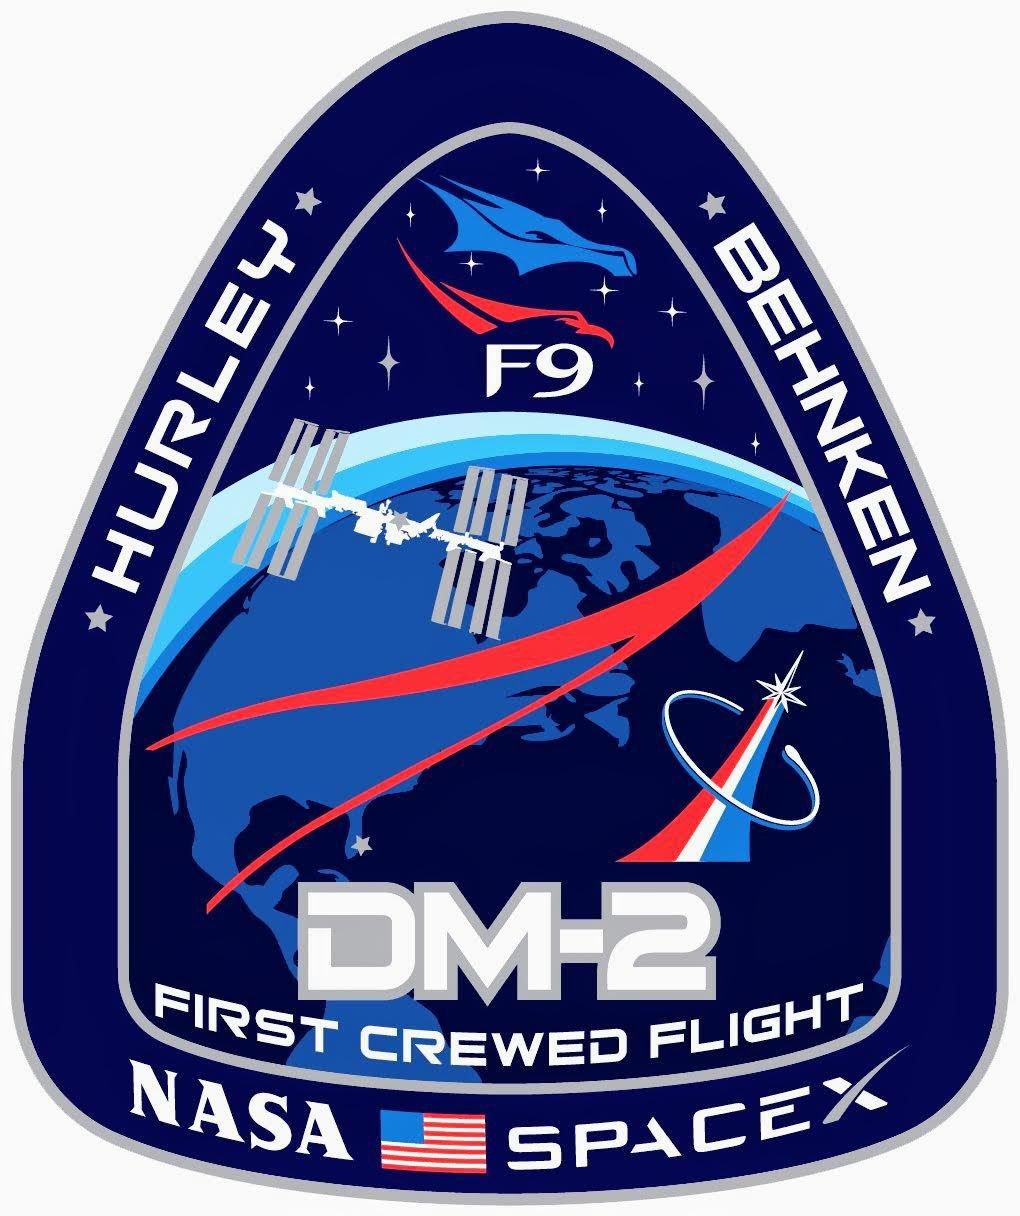 Andrew Nyberg's NASA patch